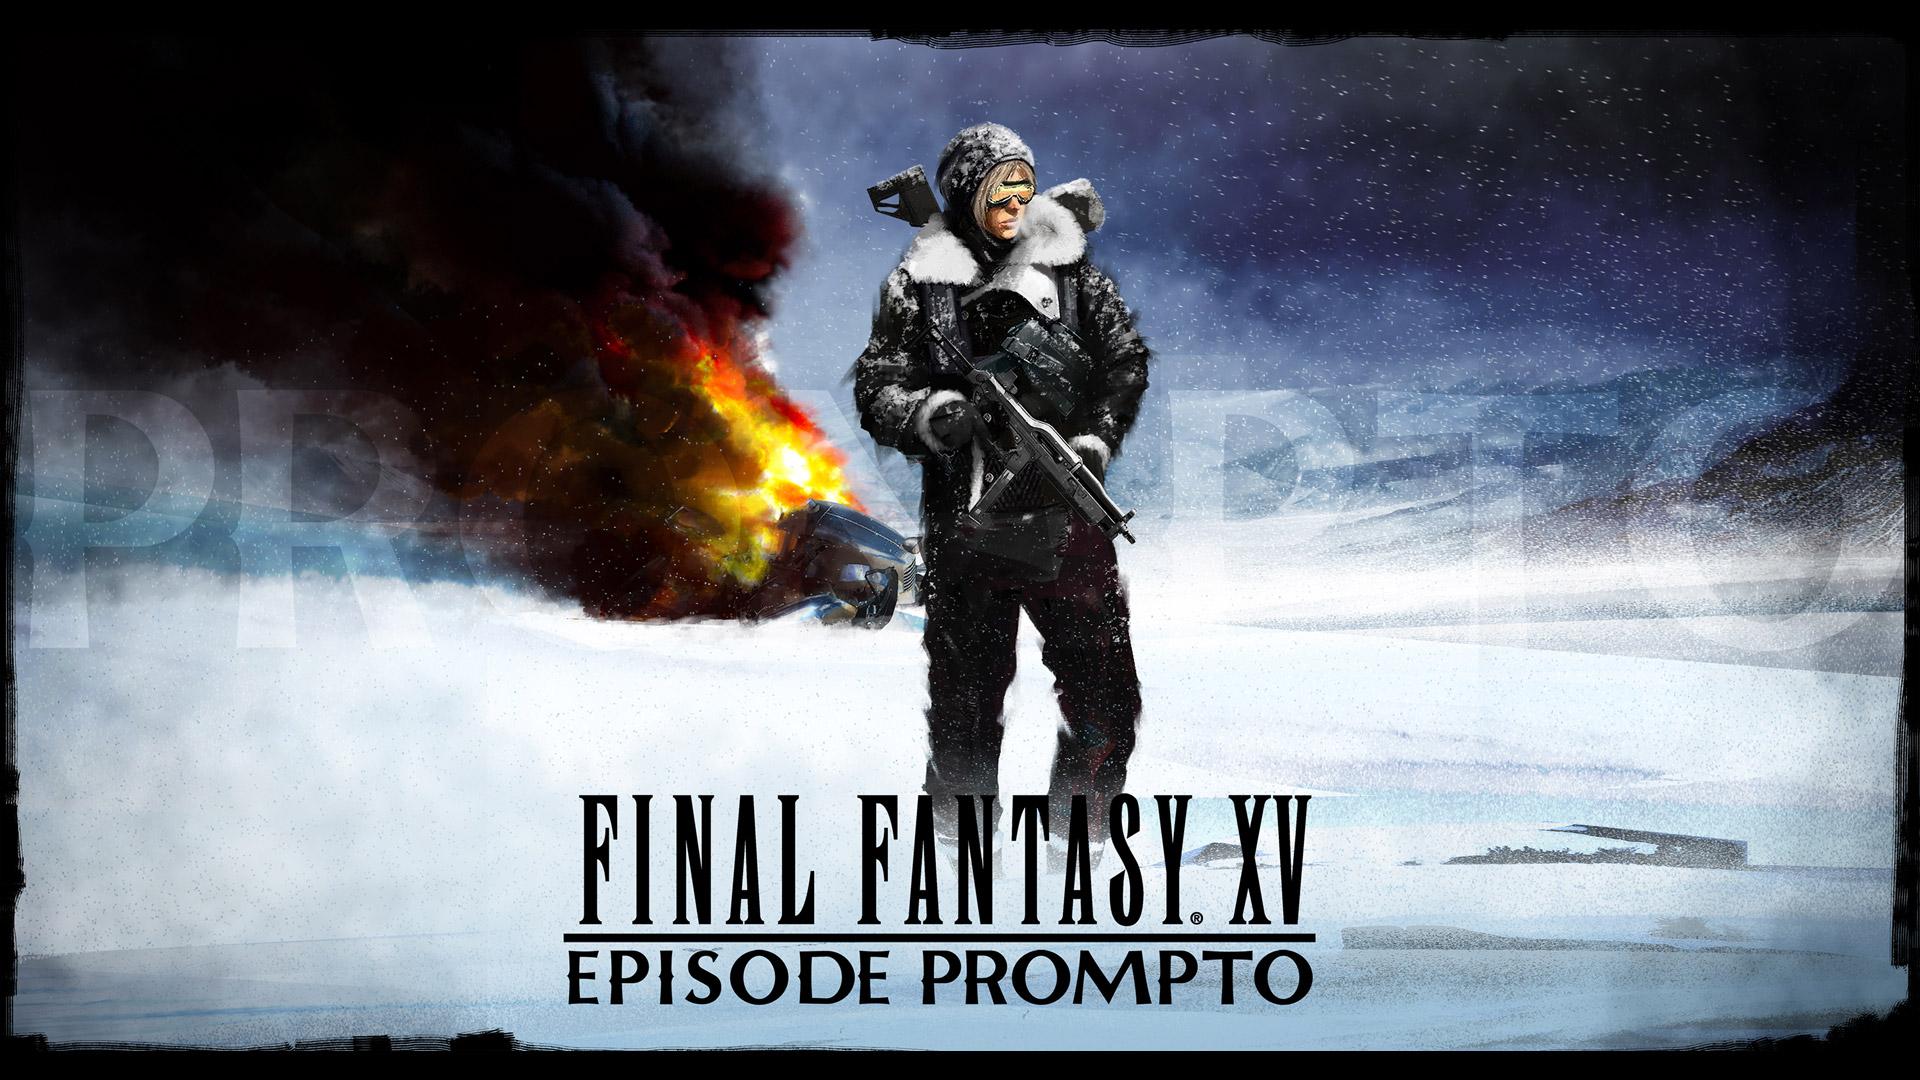 Free Final Fantasy XV Wallpaper in 1920x1080